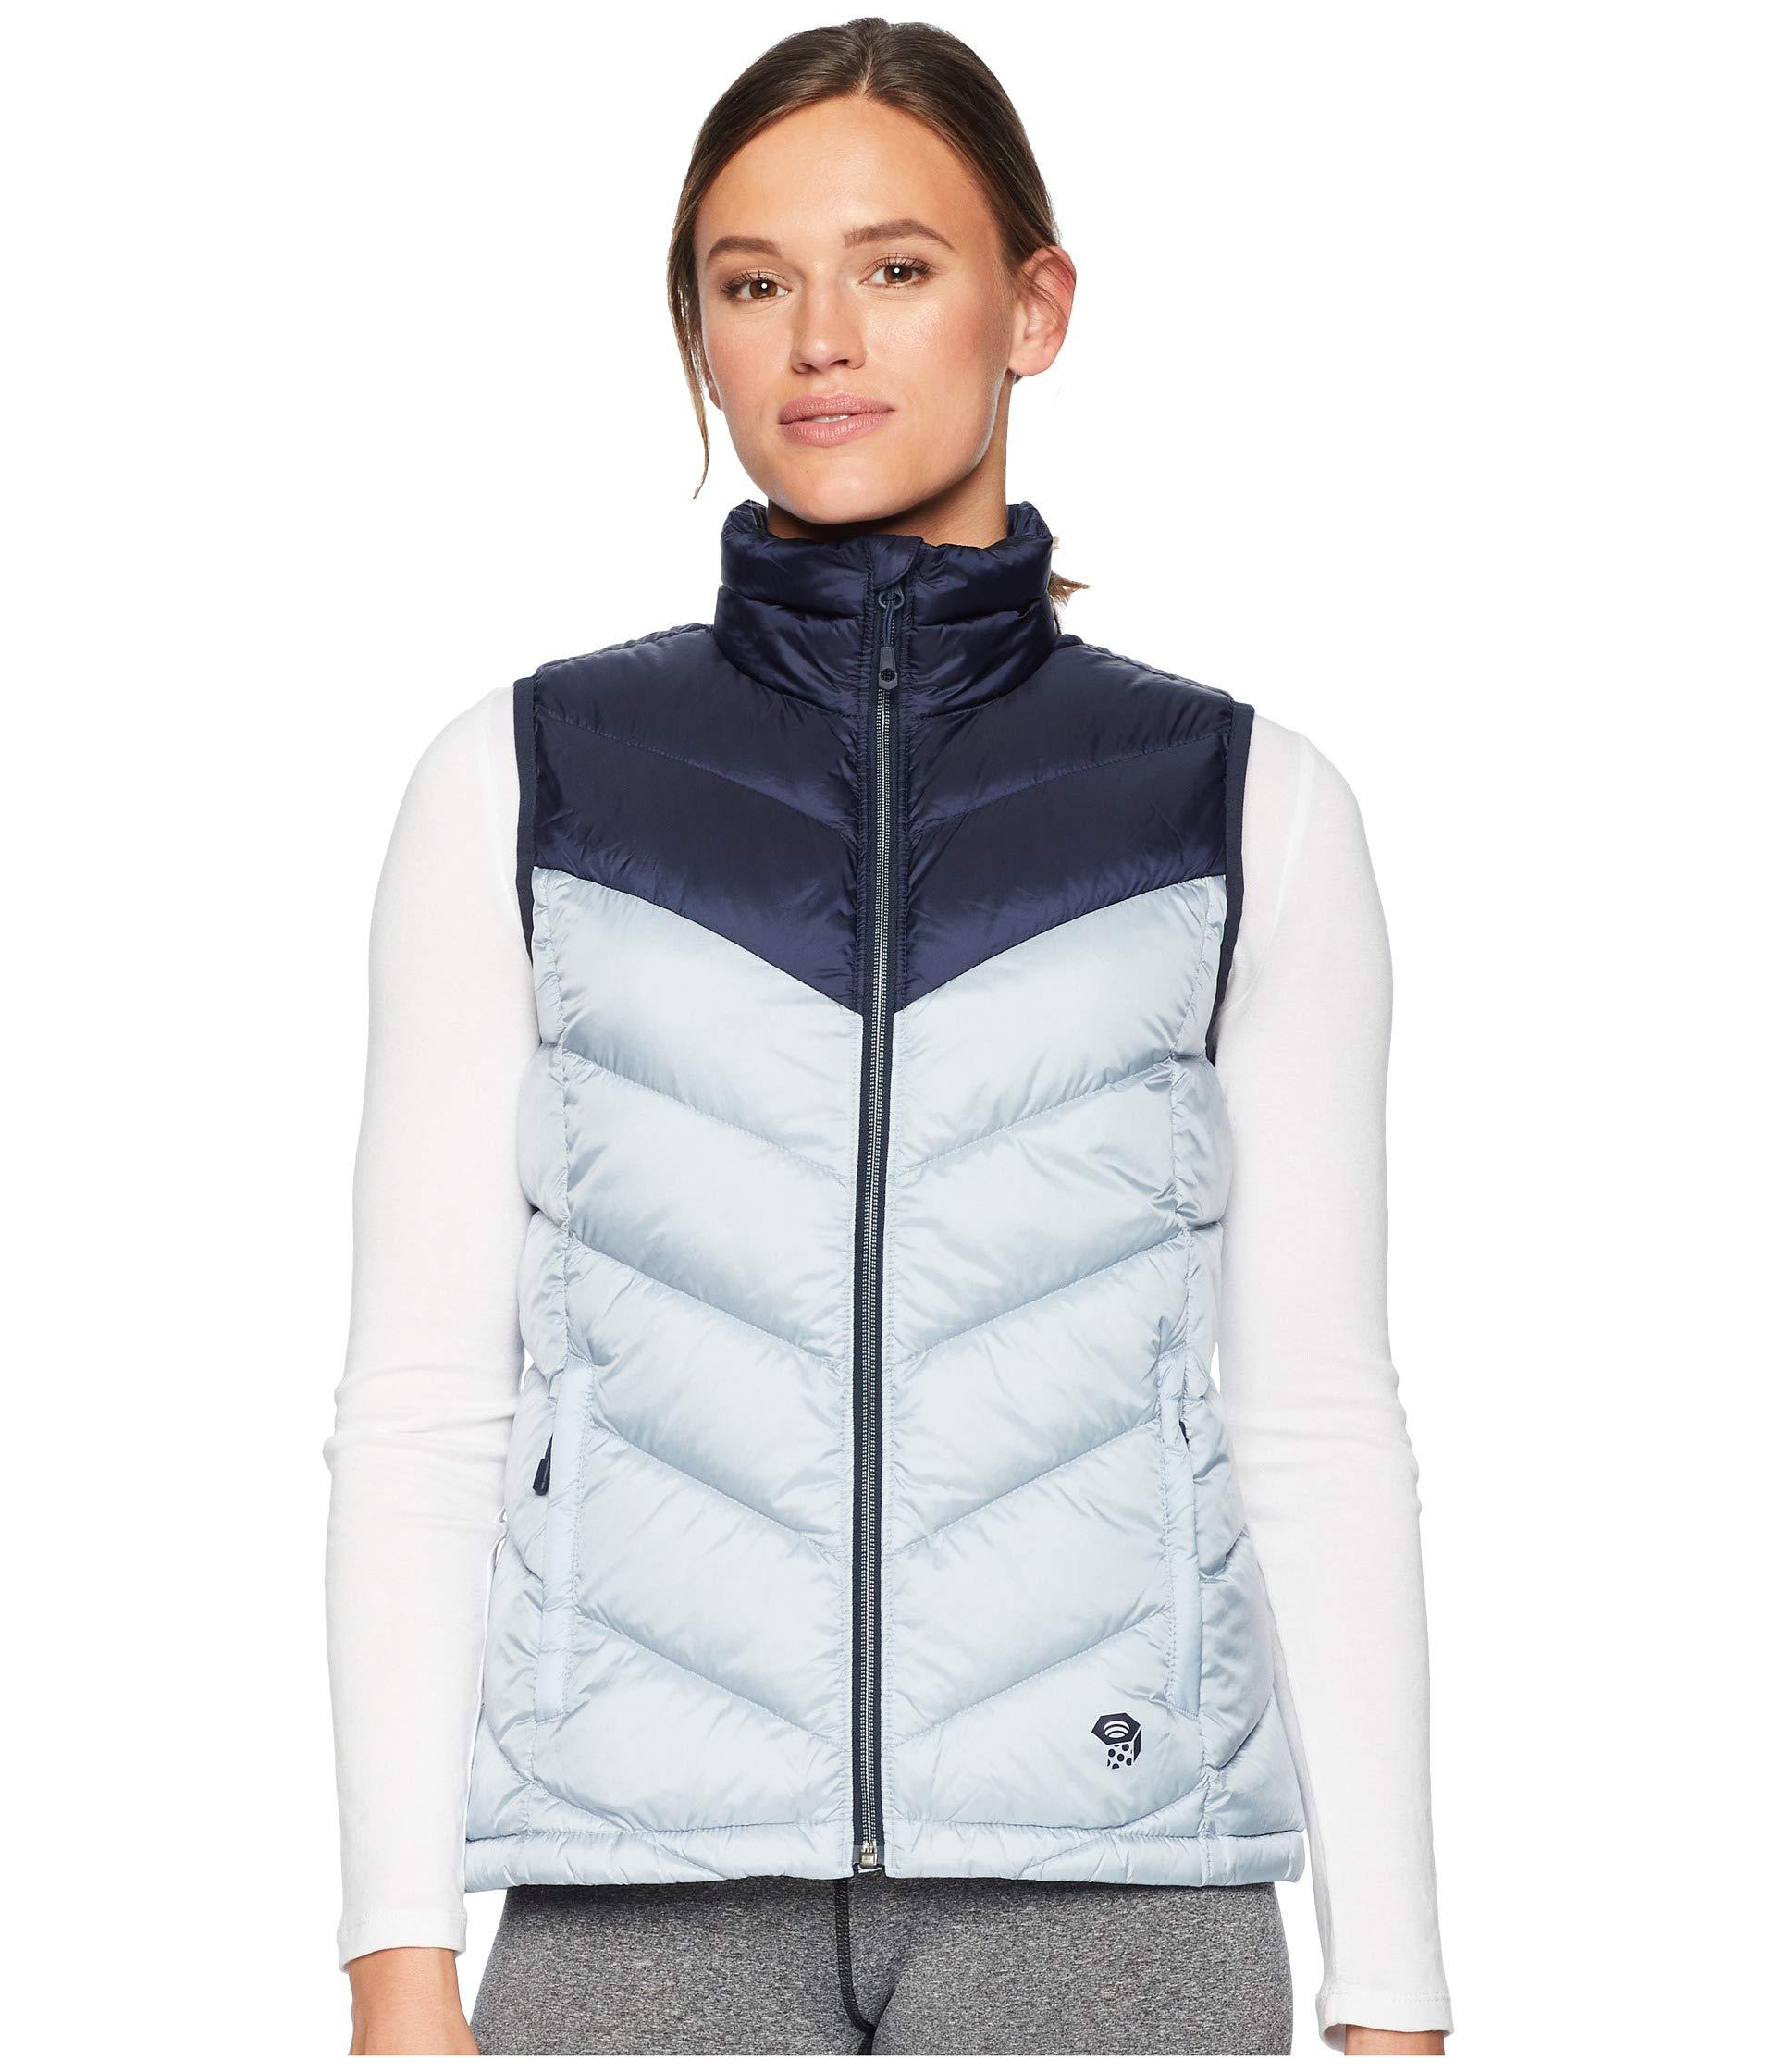 Mountain Hardwear Women's Ratio Insulated Down Water-Resistant Puffer Vest by Mountain Hardwear